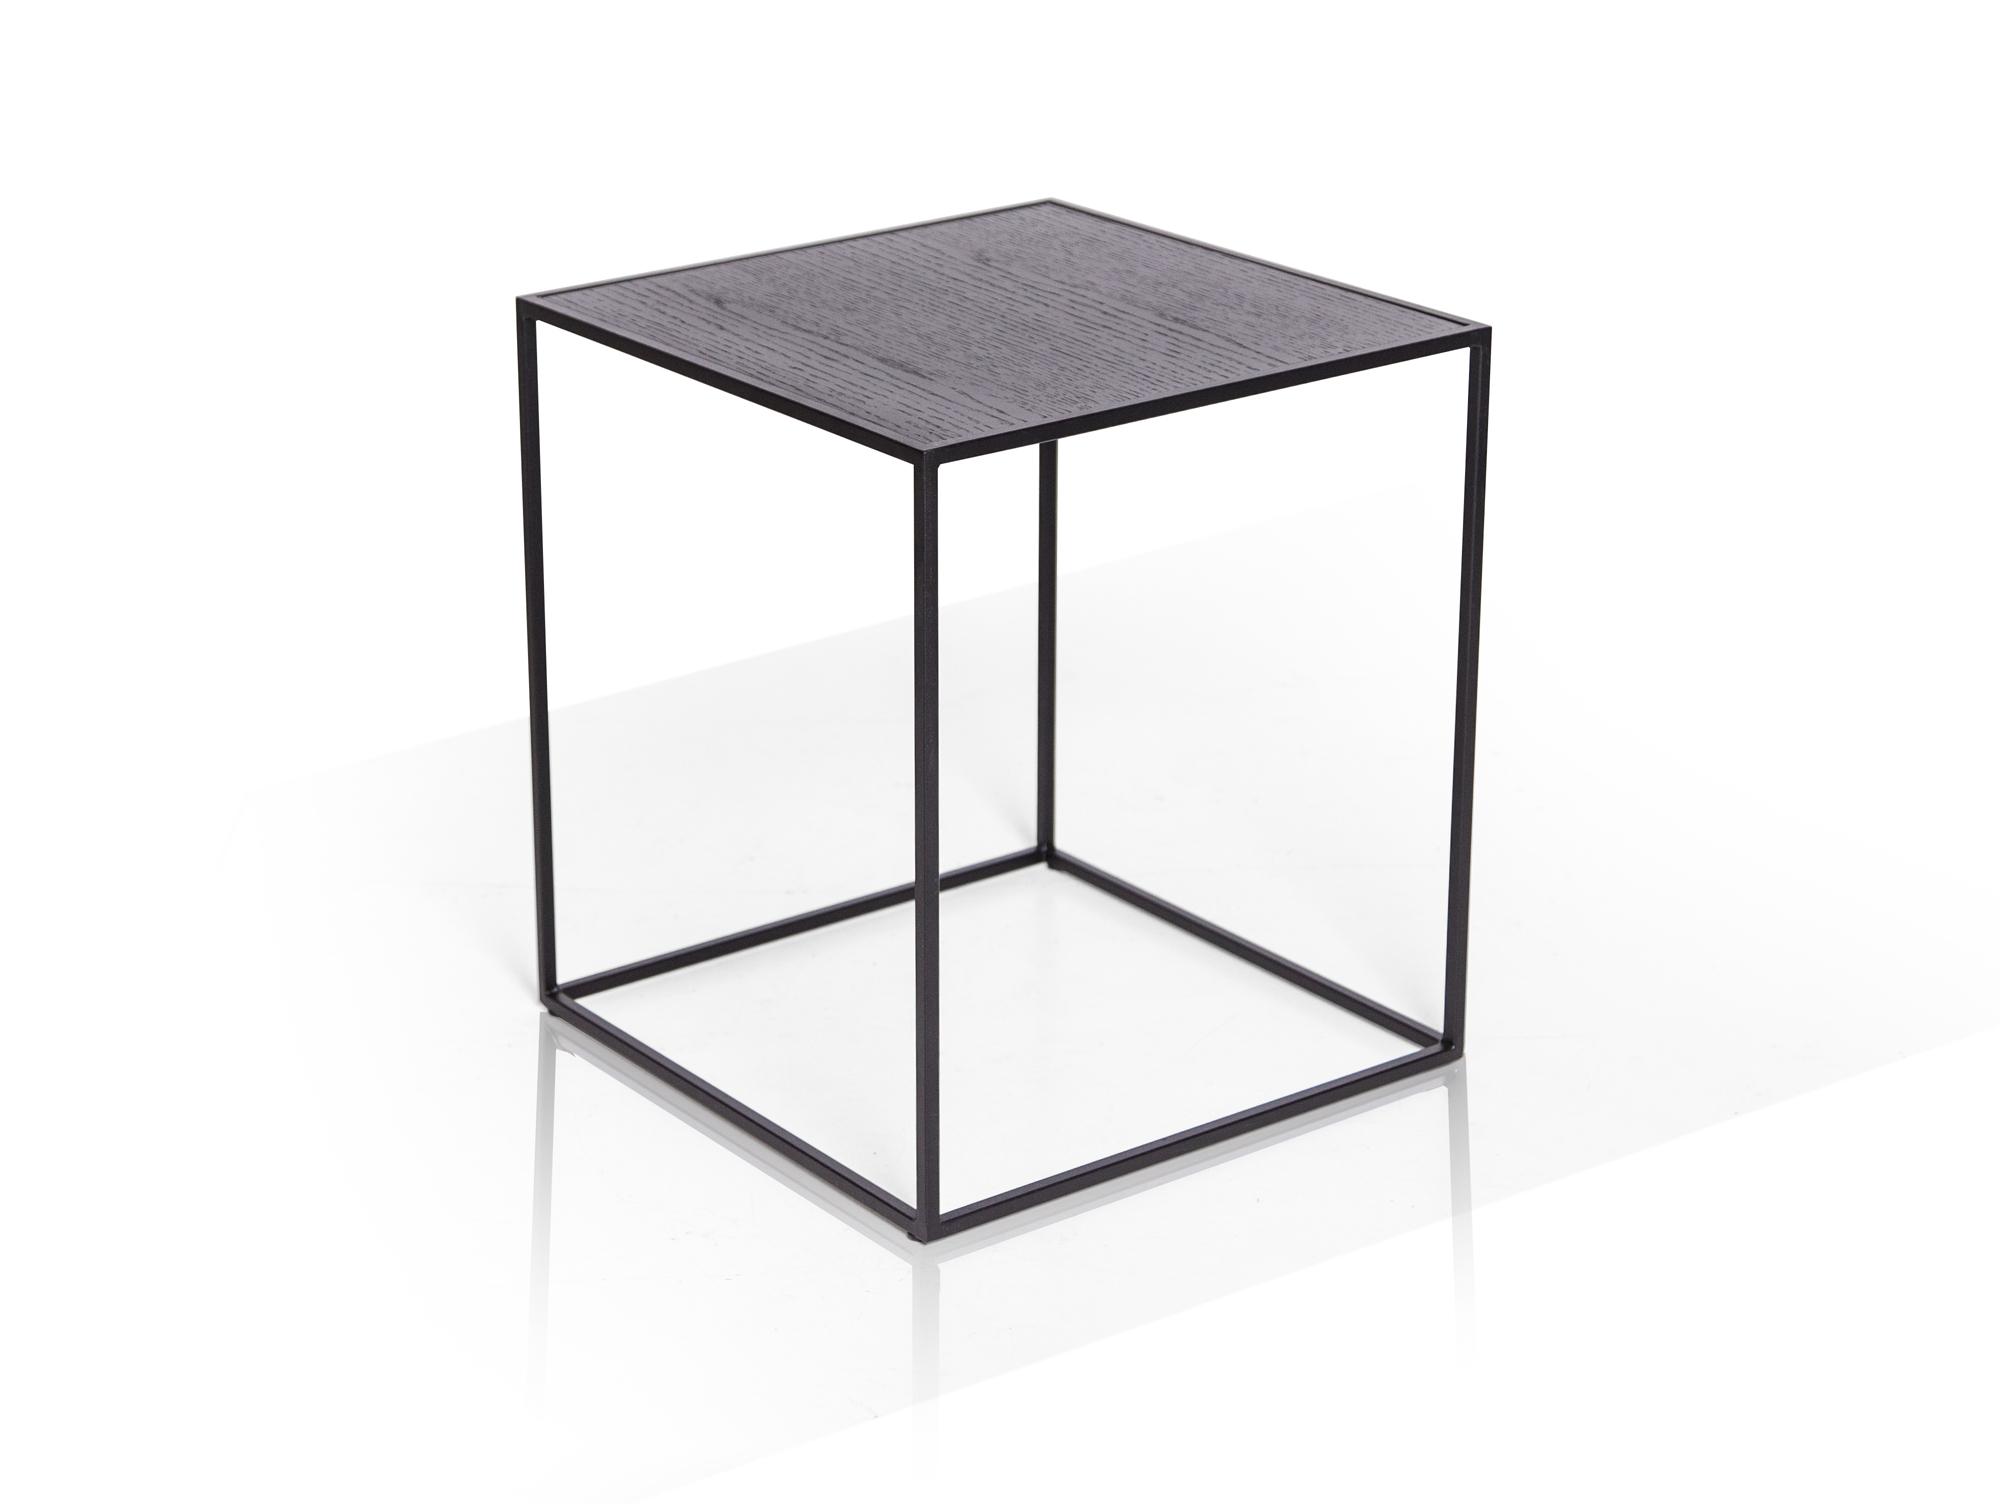 MEGGY Beistelltisch 40x40 cm, Material Metall, mit Platte in